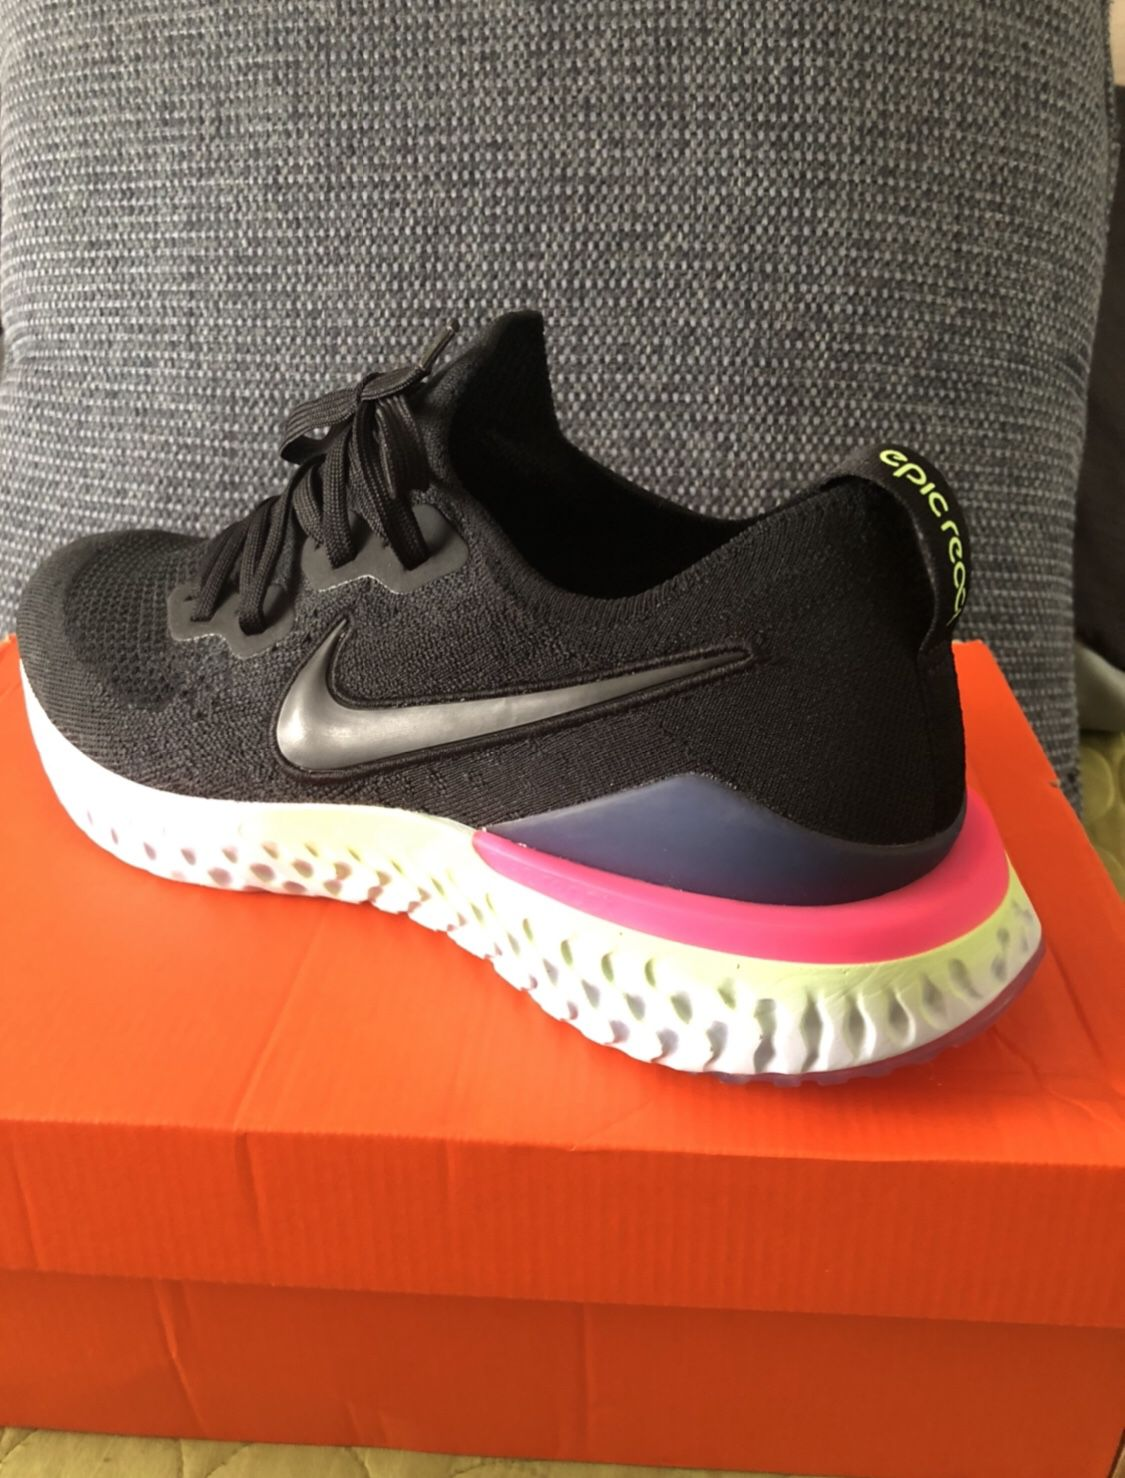 New Men's Nike Size 12